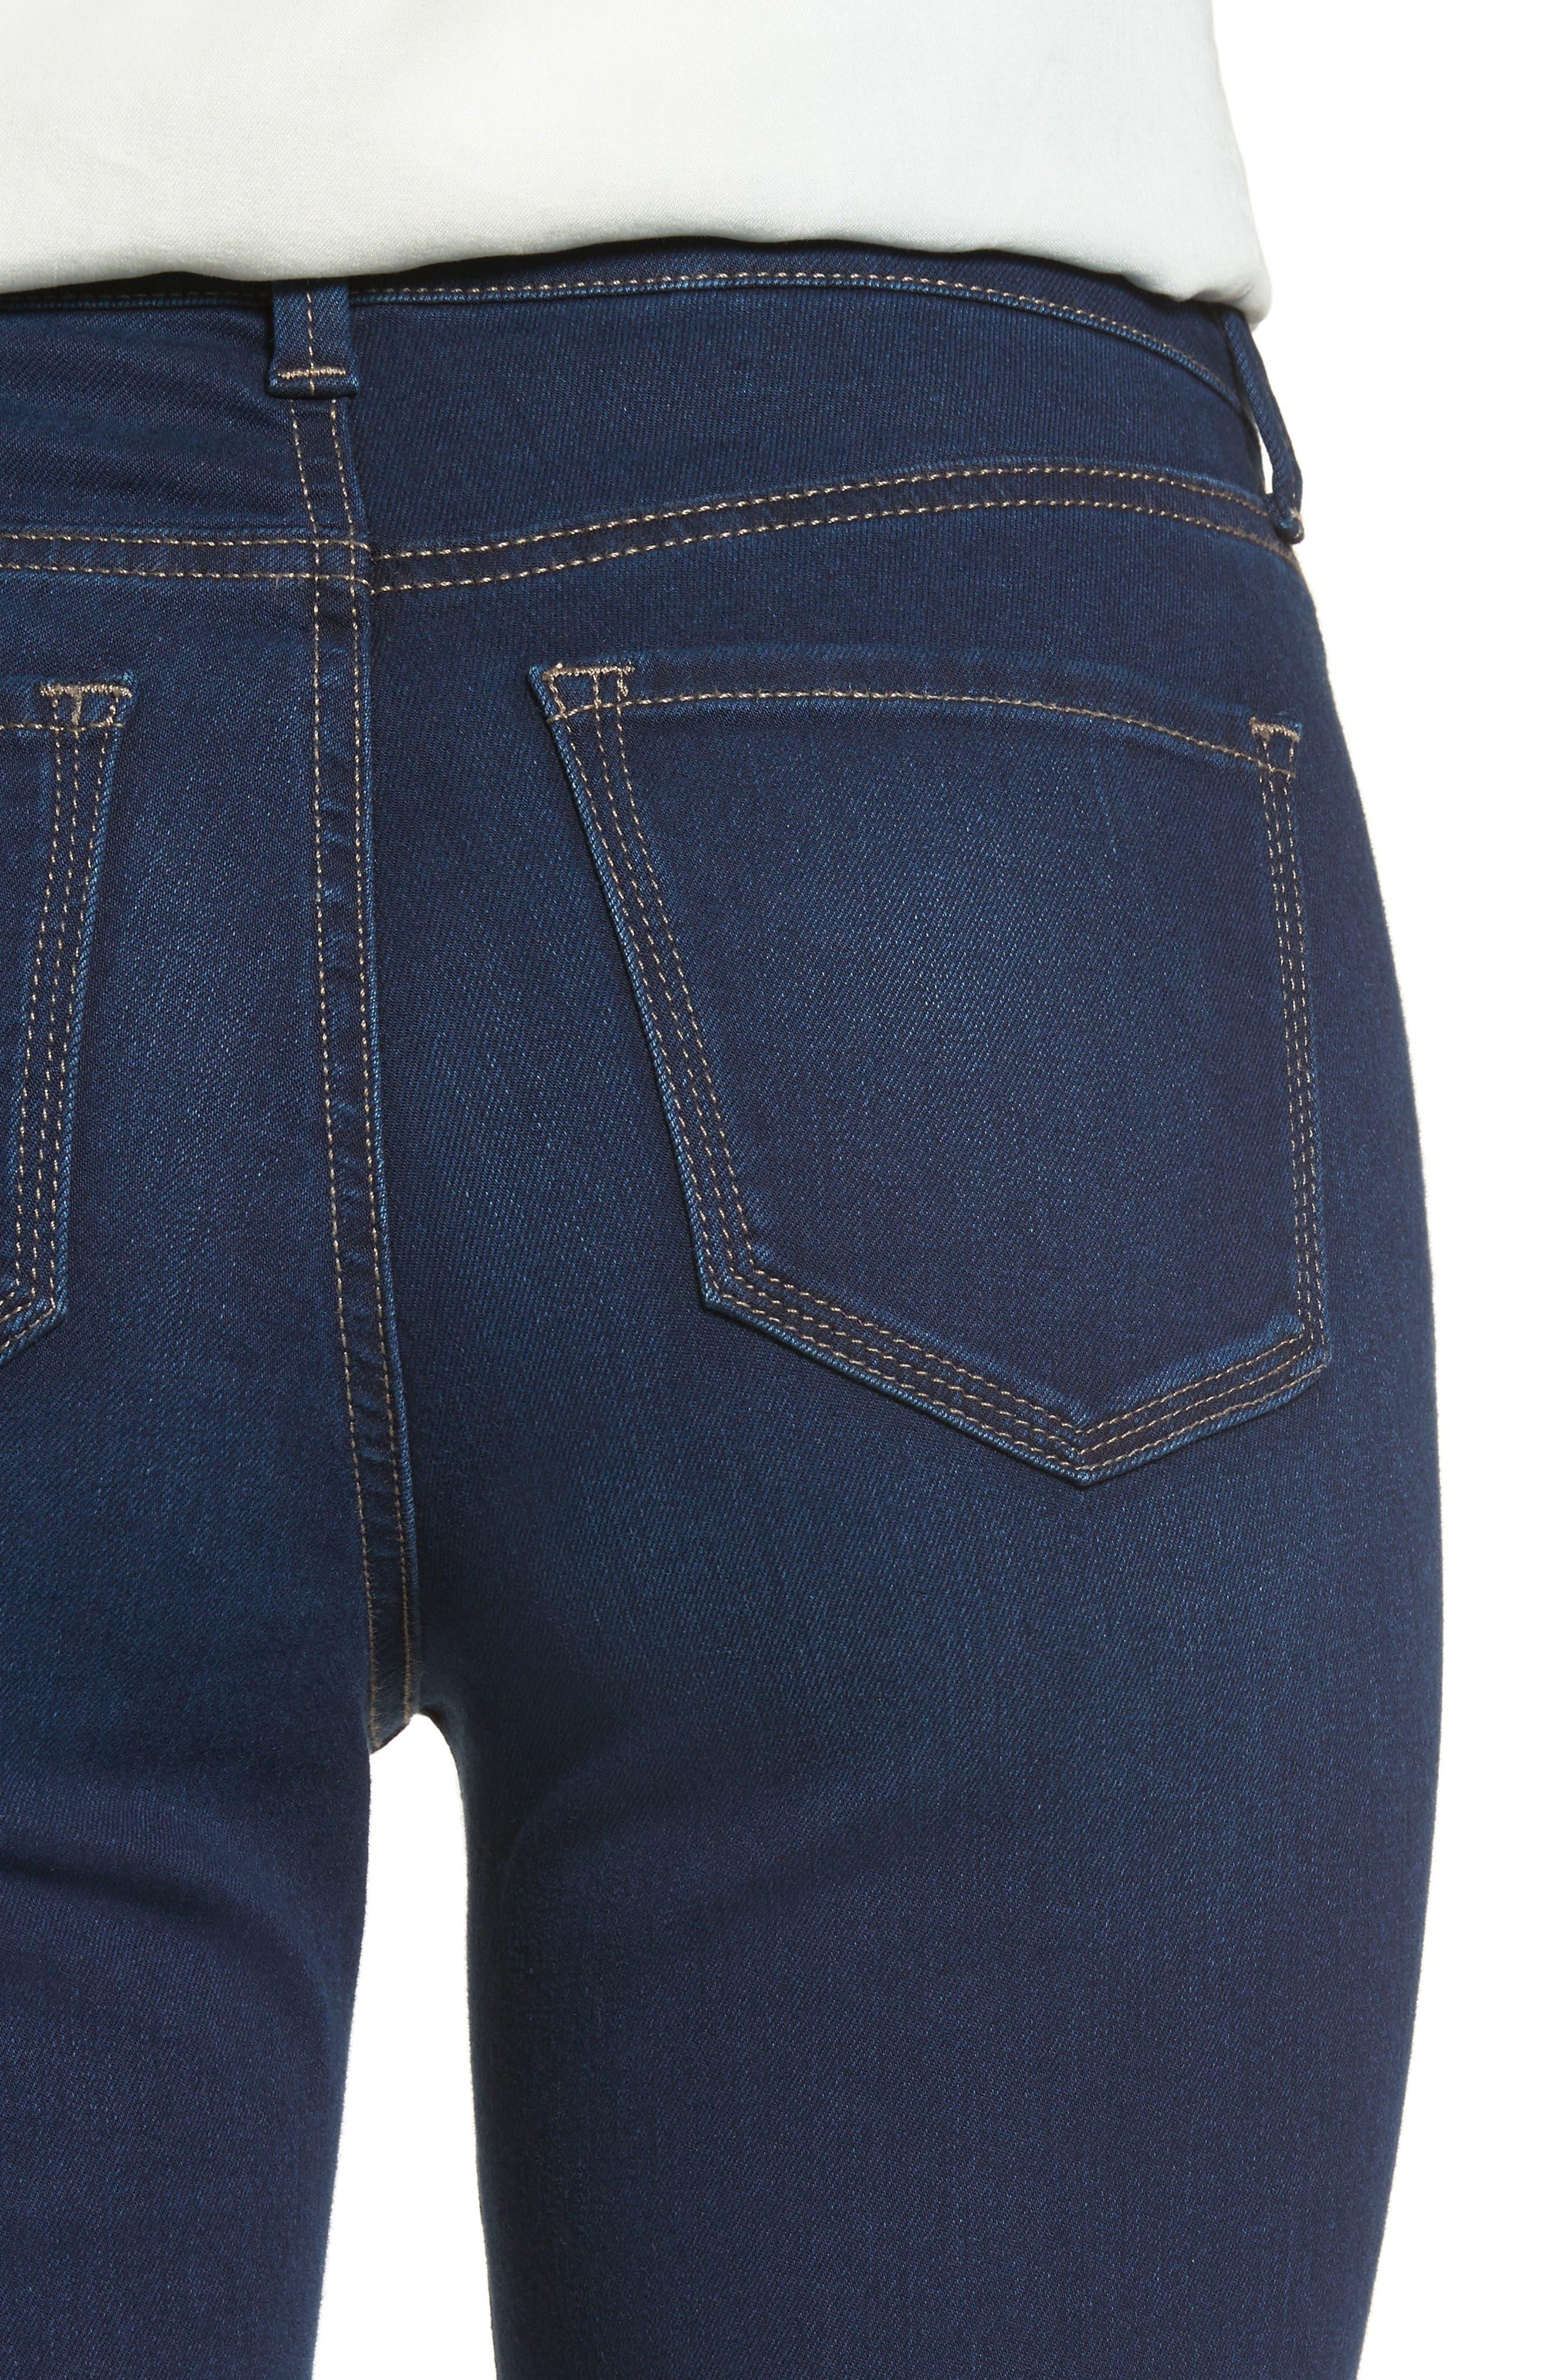 Marilyn Stretch Straight Leg Jeans,                             Alternate thumbnail 4, color,                             402